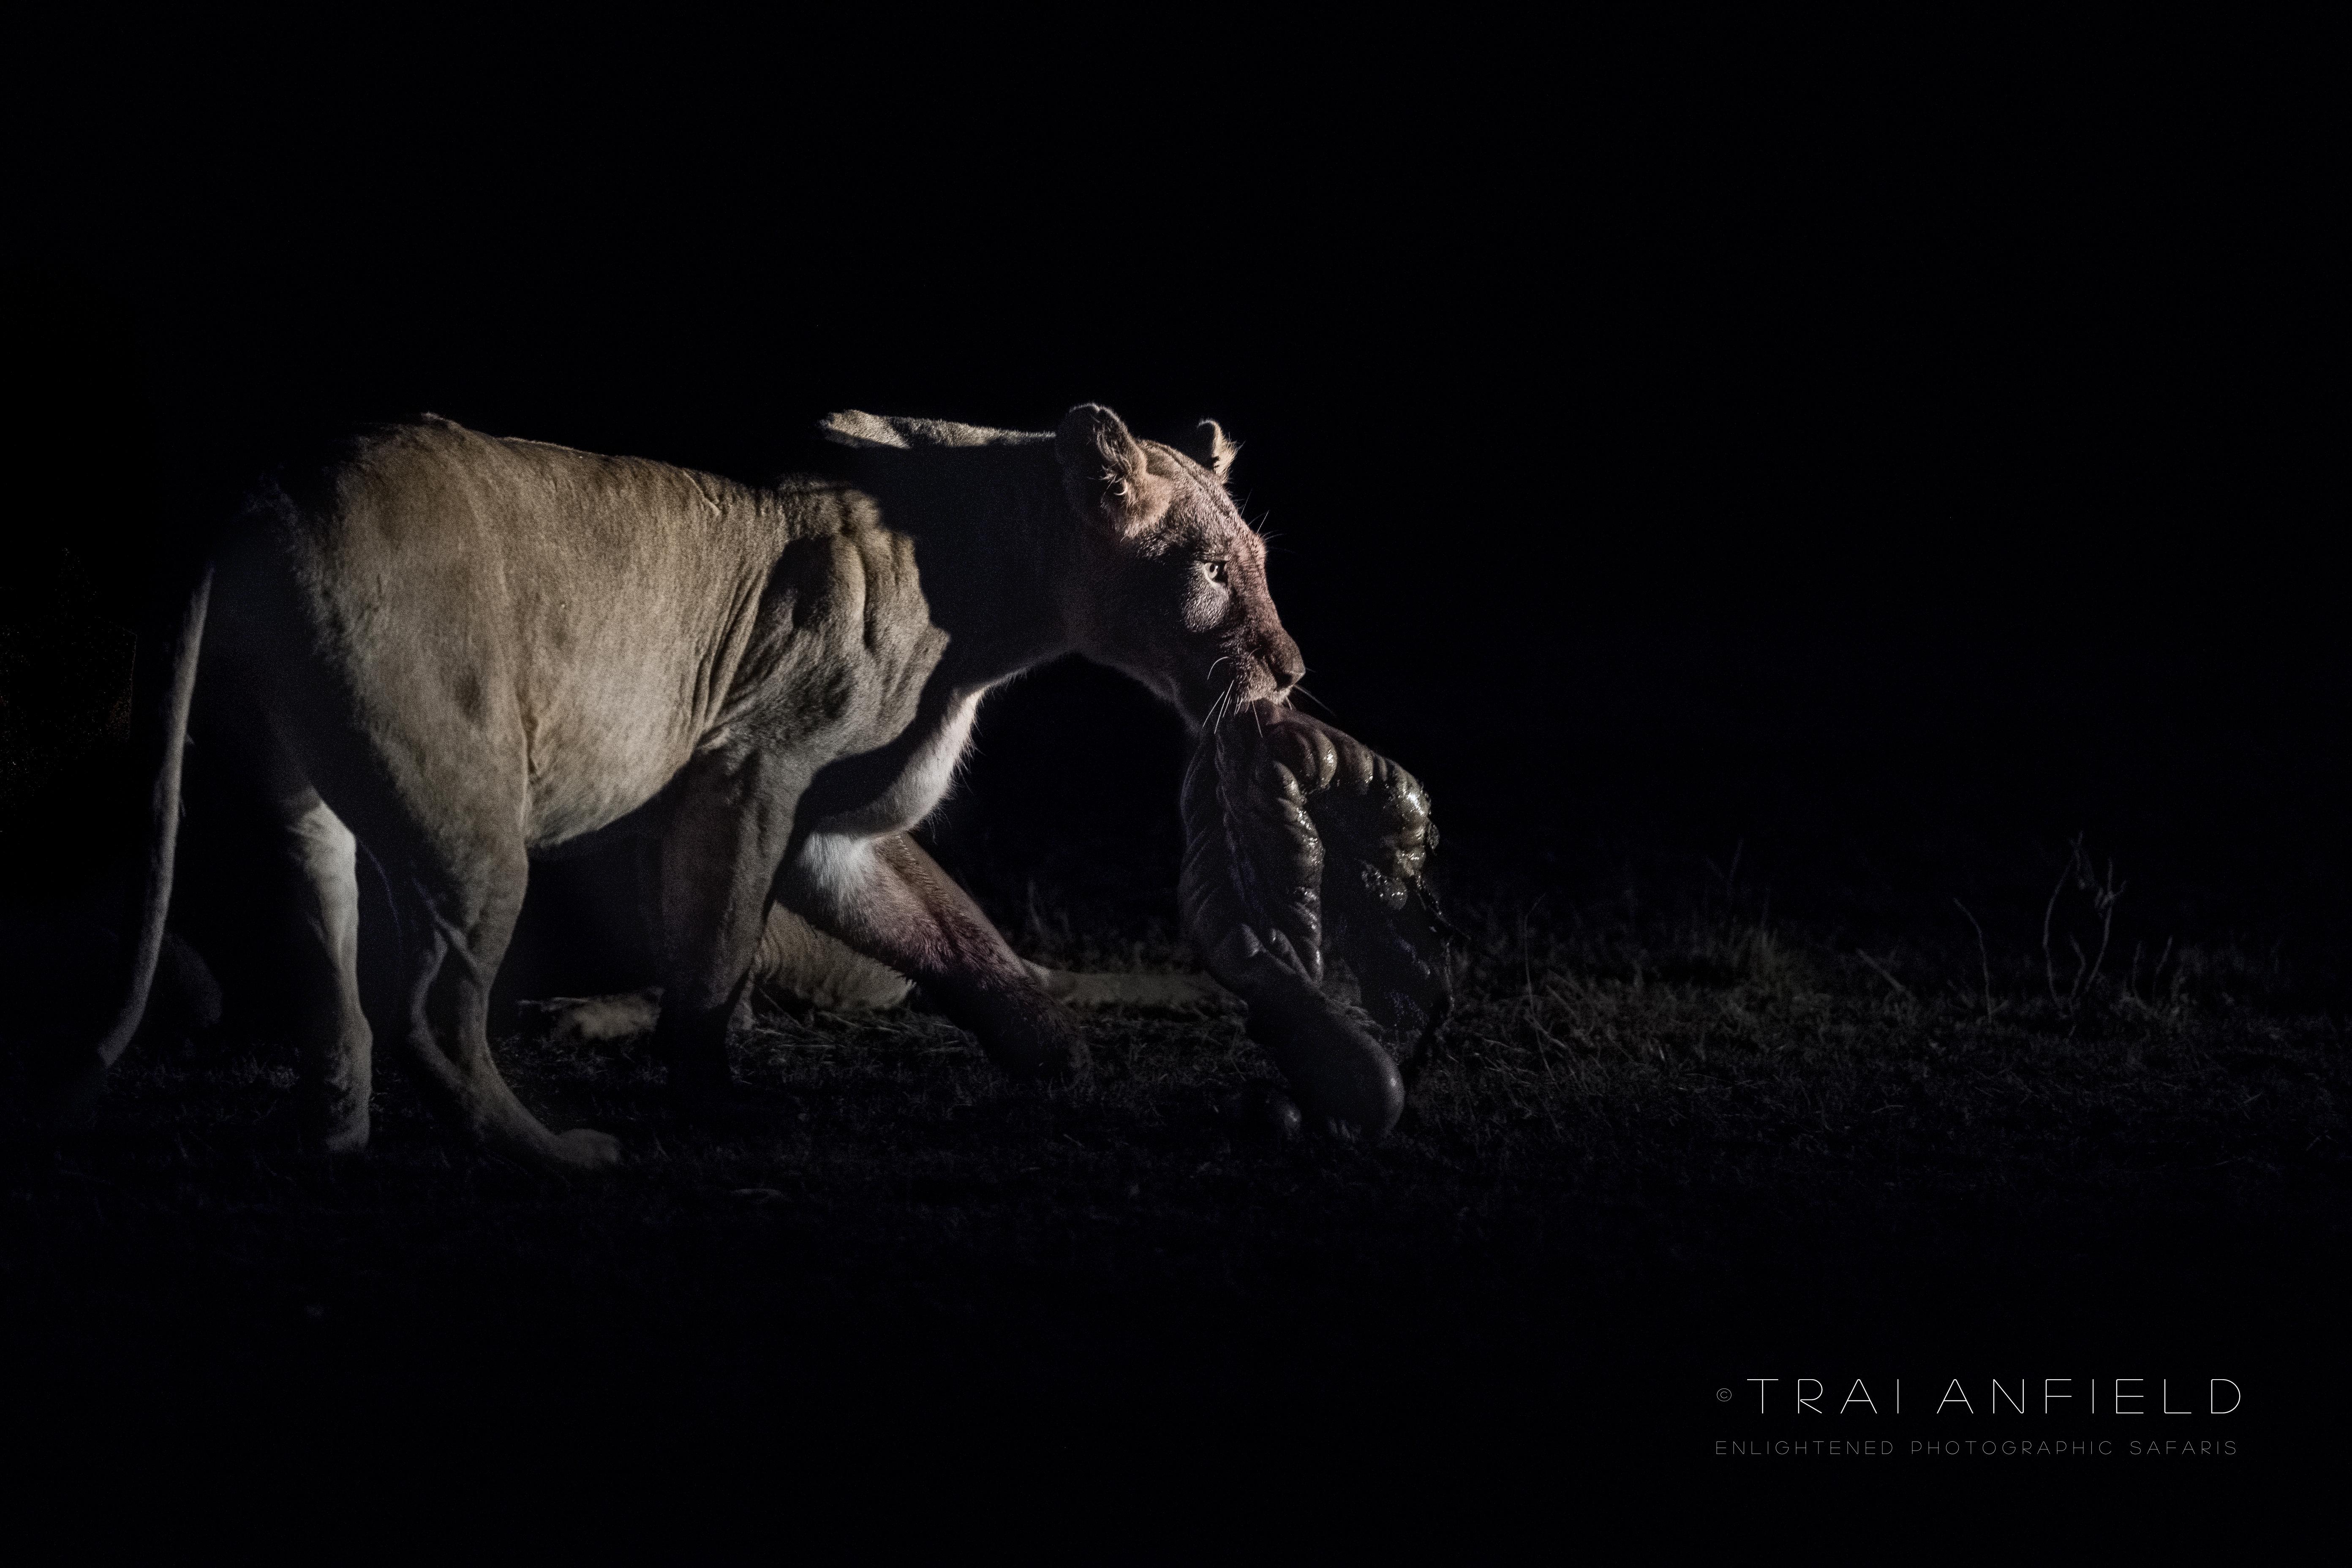 Trai Anfield Enlightened Photographic Safaris Kenya Serian lion kill-8393-WEB.jpg